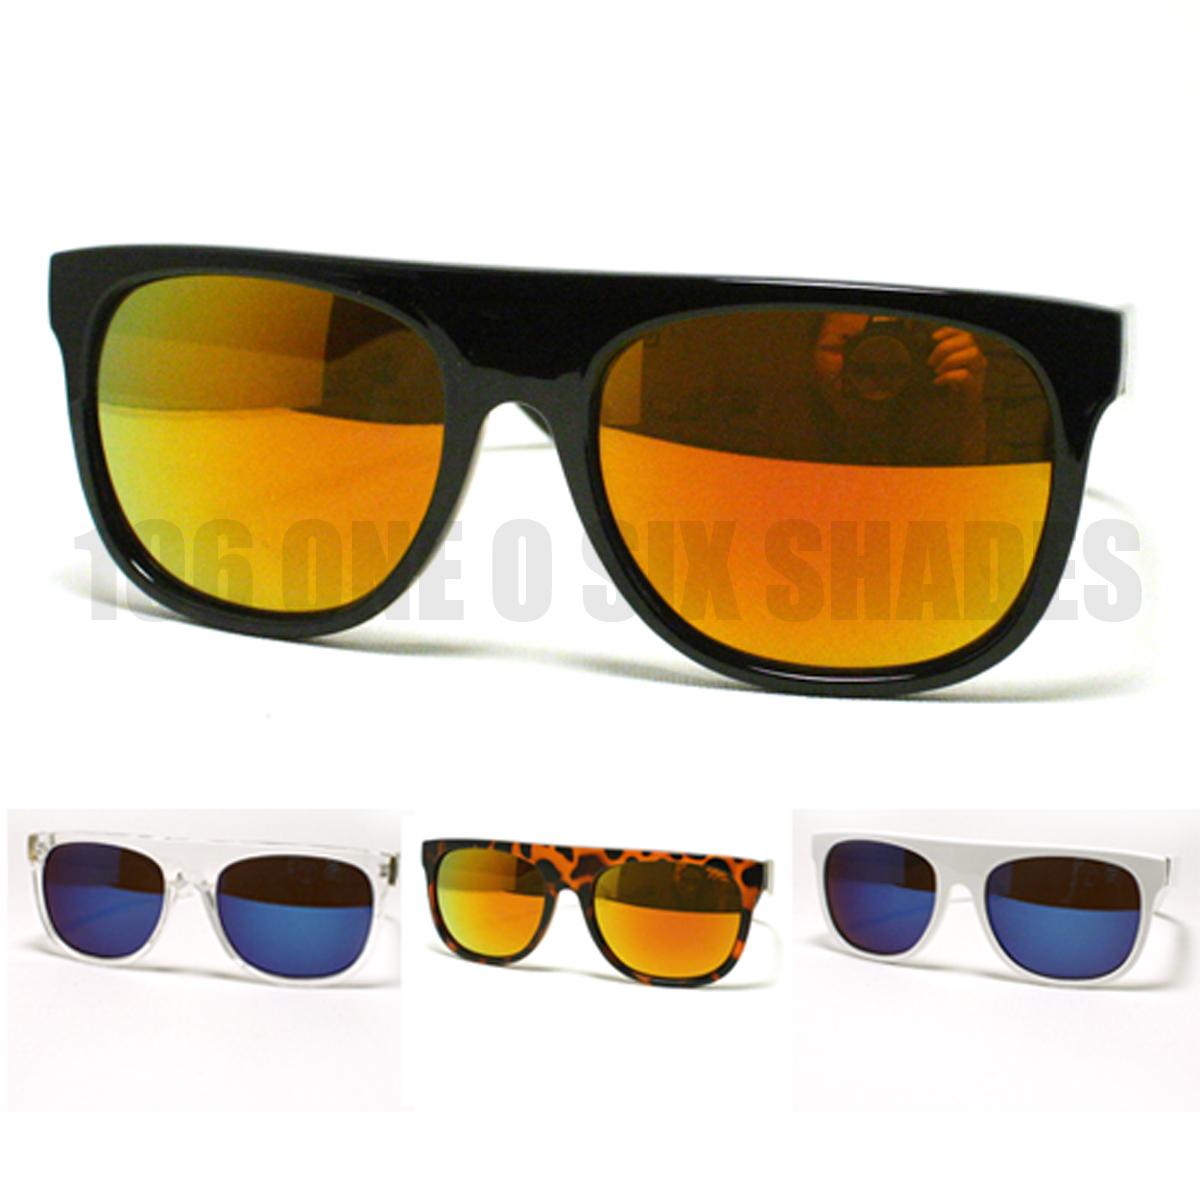 Retro flat top sunglasses vintage super shades color mirror lens nerd skaters